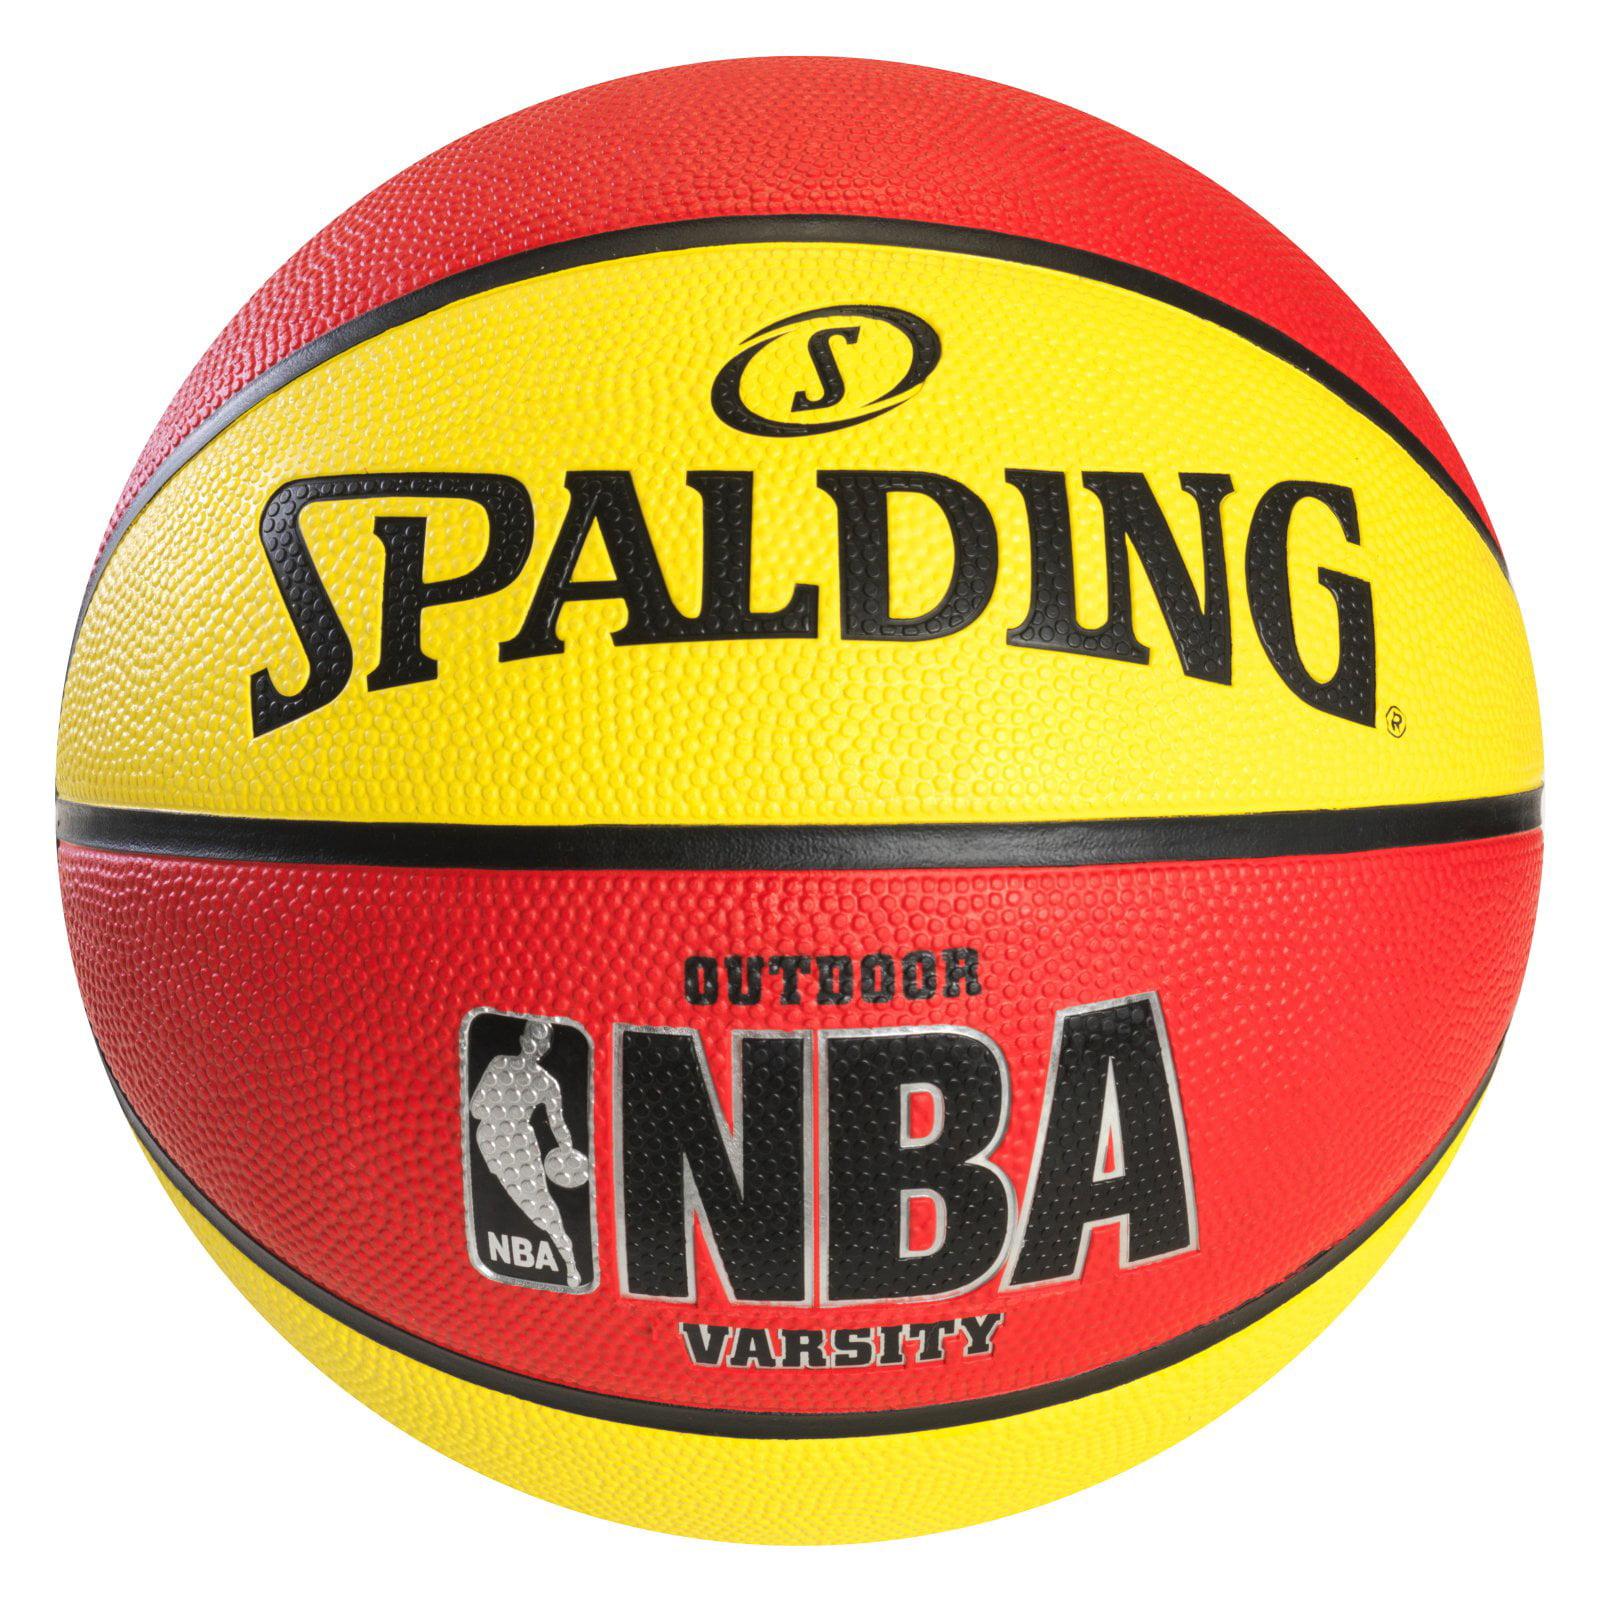 "Spalding NBA Varsity 28.5"" Basketball"